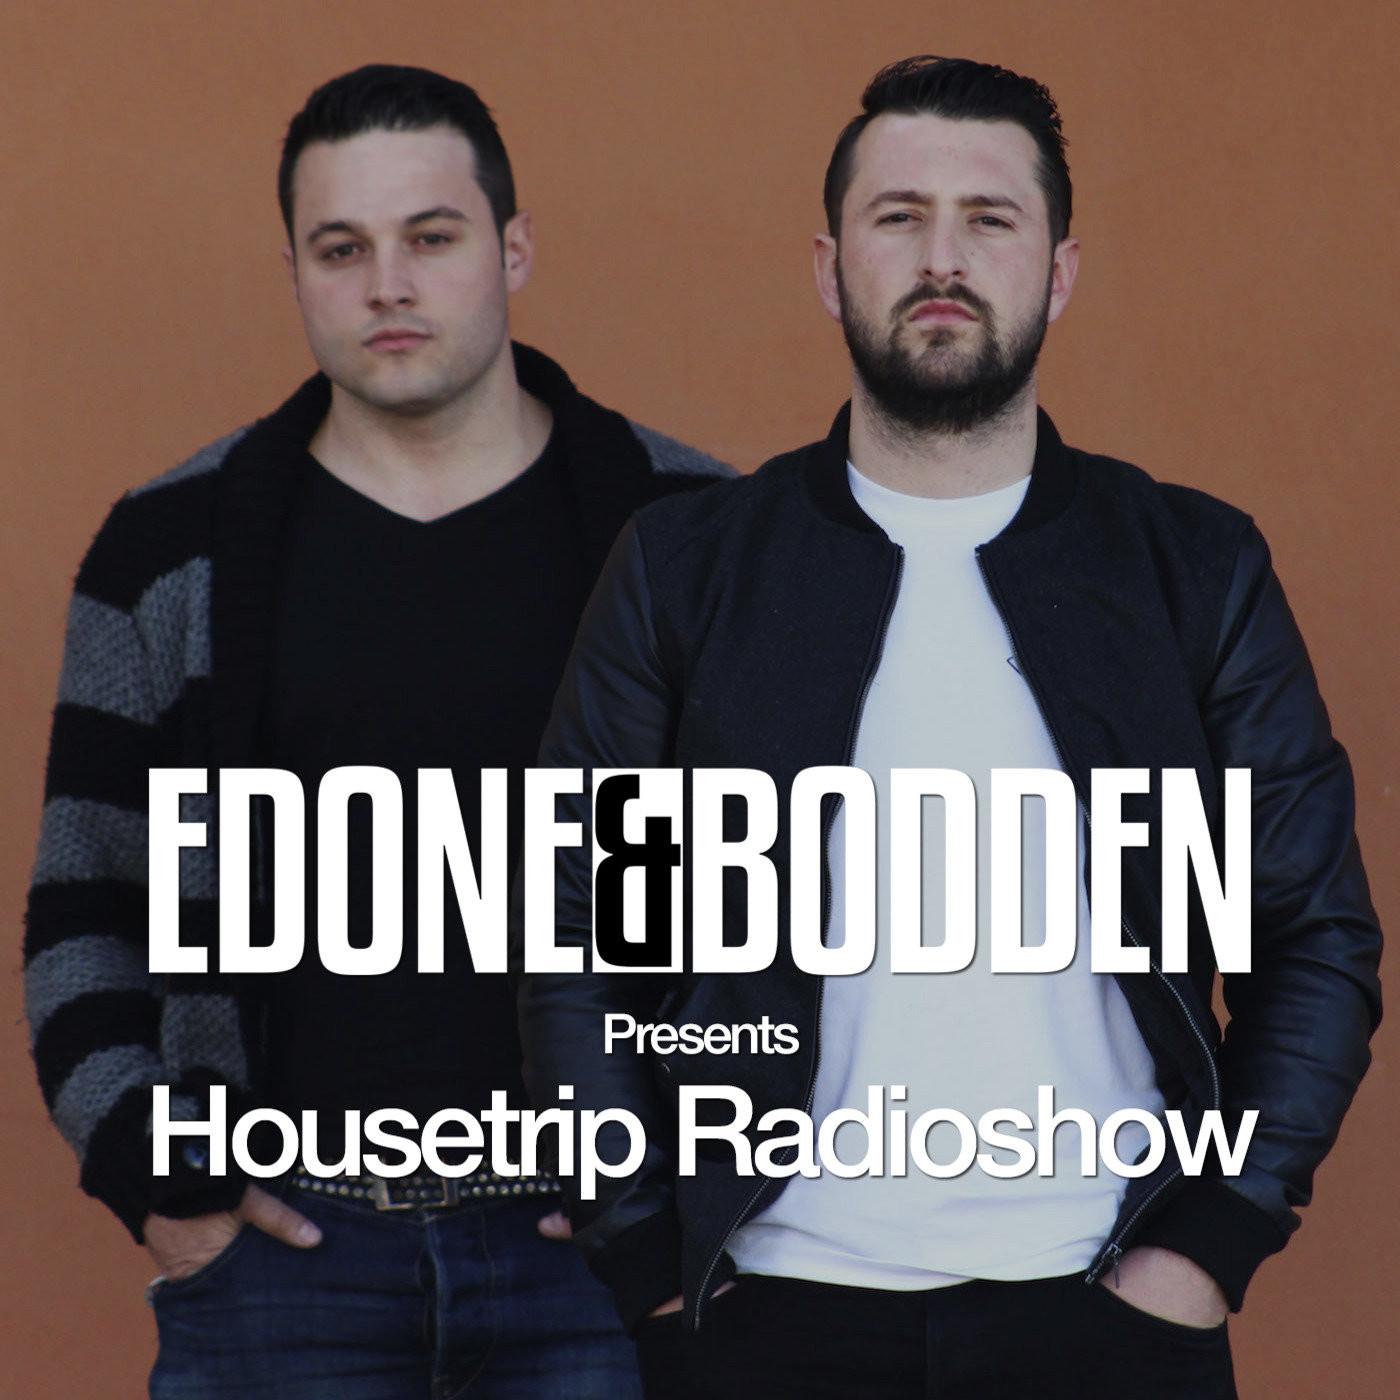 <![CDATA[EdOne & Bodden | Housetrip Radioshow]]>